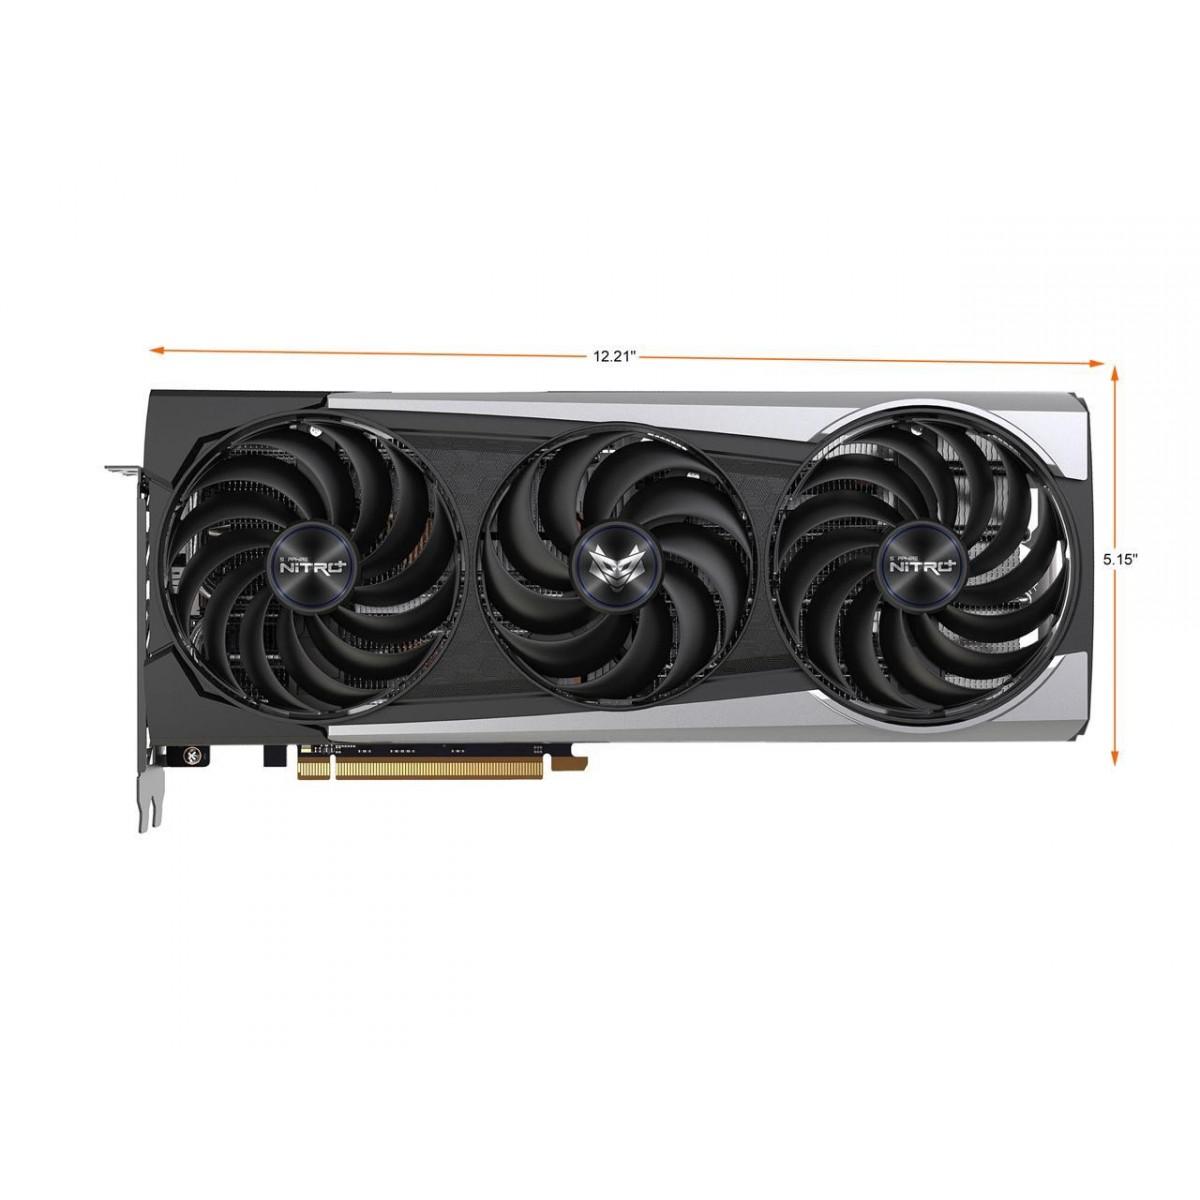 Placa de Vídeo Sapphire  Nitro+ AMD Radeon RX 6700 XT, 12GB, GDDR6, FSR, Ray Tracing, 11306-01-20T